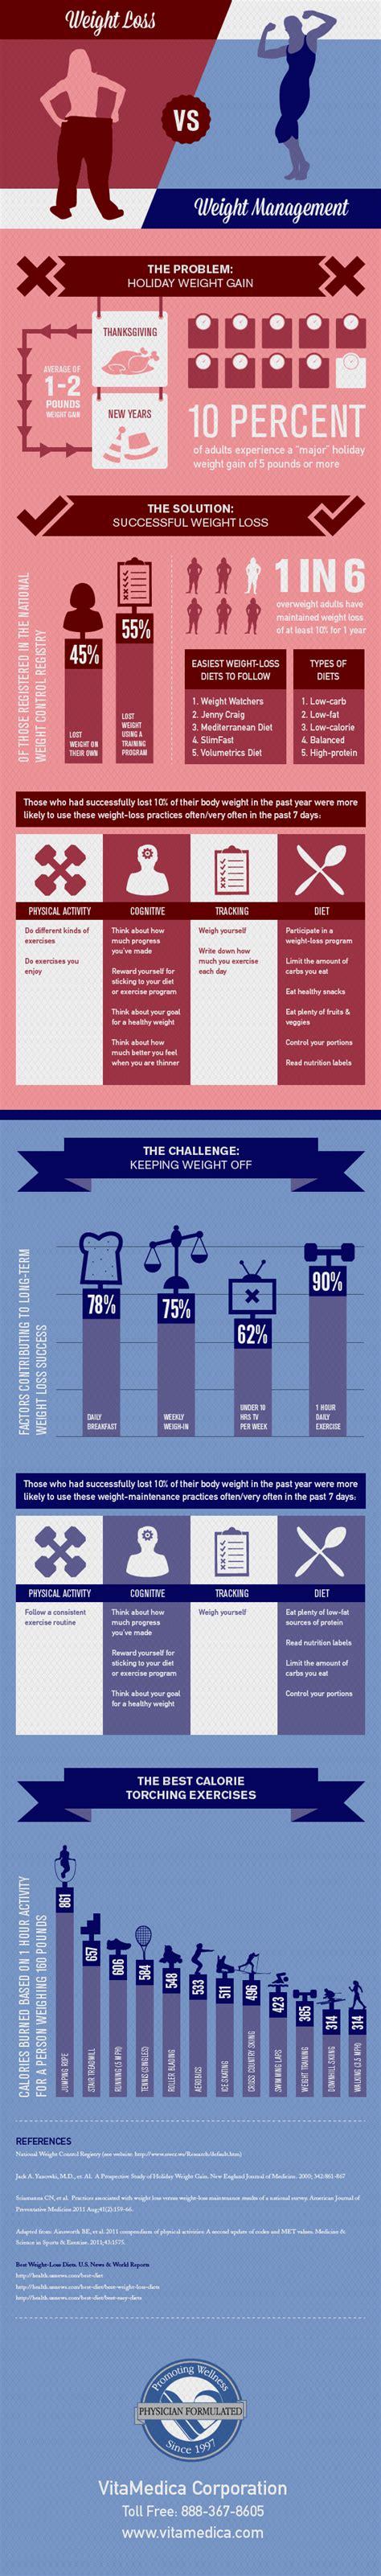 weight management vs weight loss weight loss vs weight management ilostmyweight